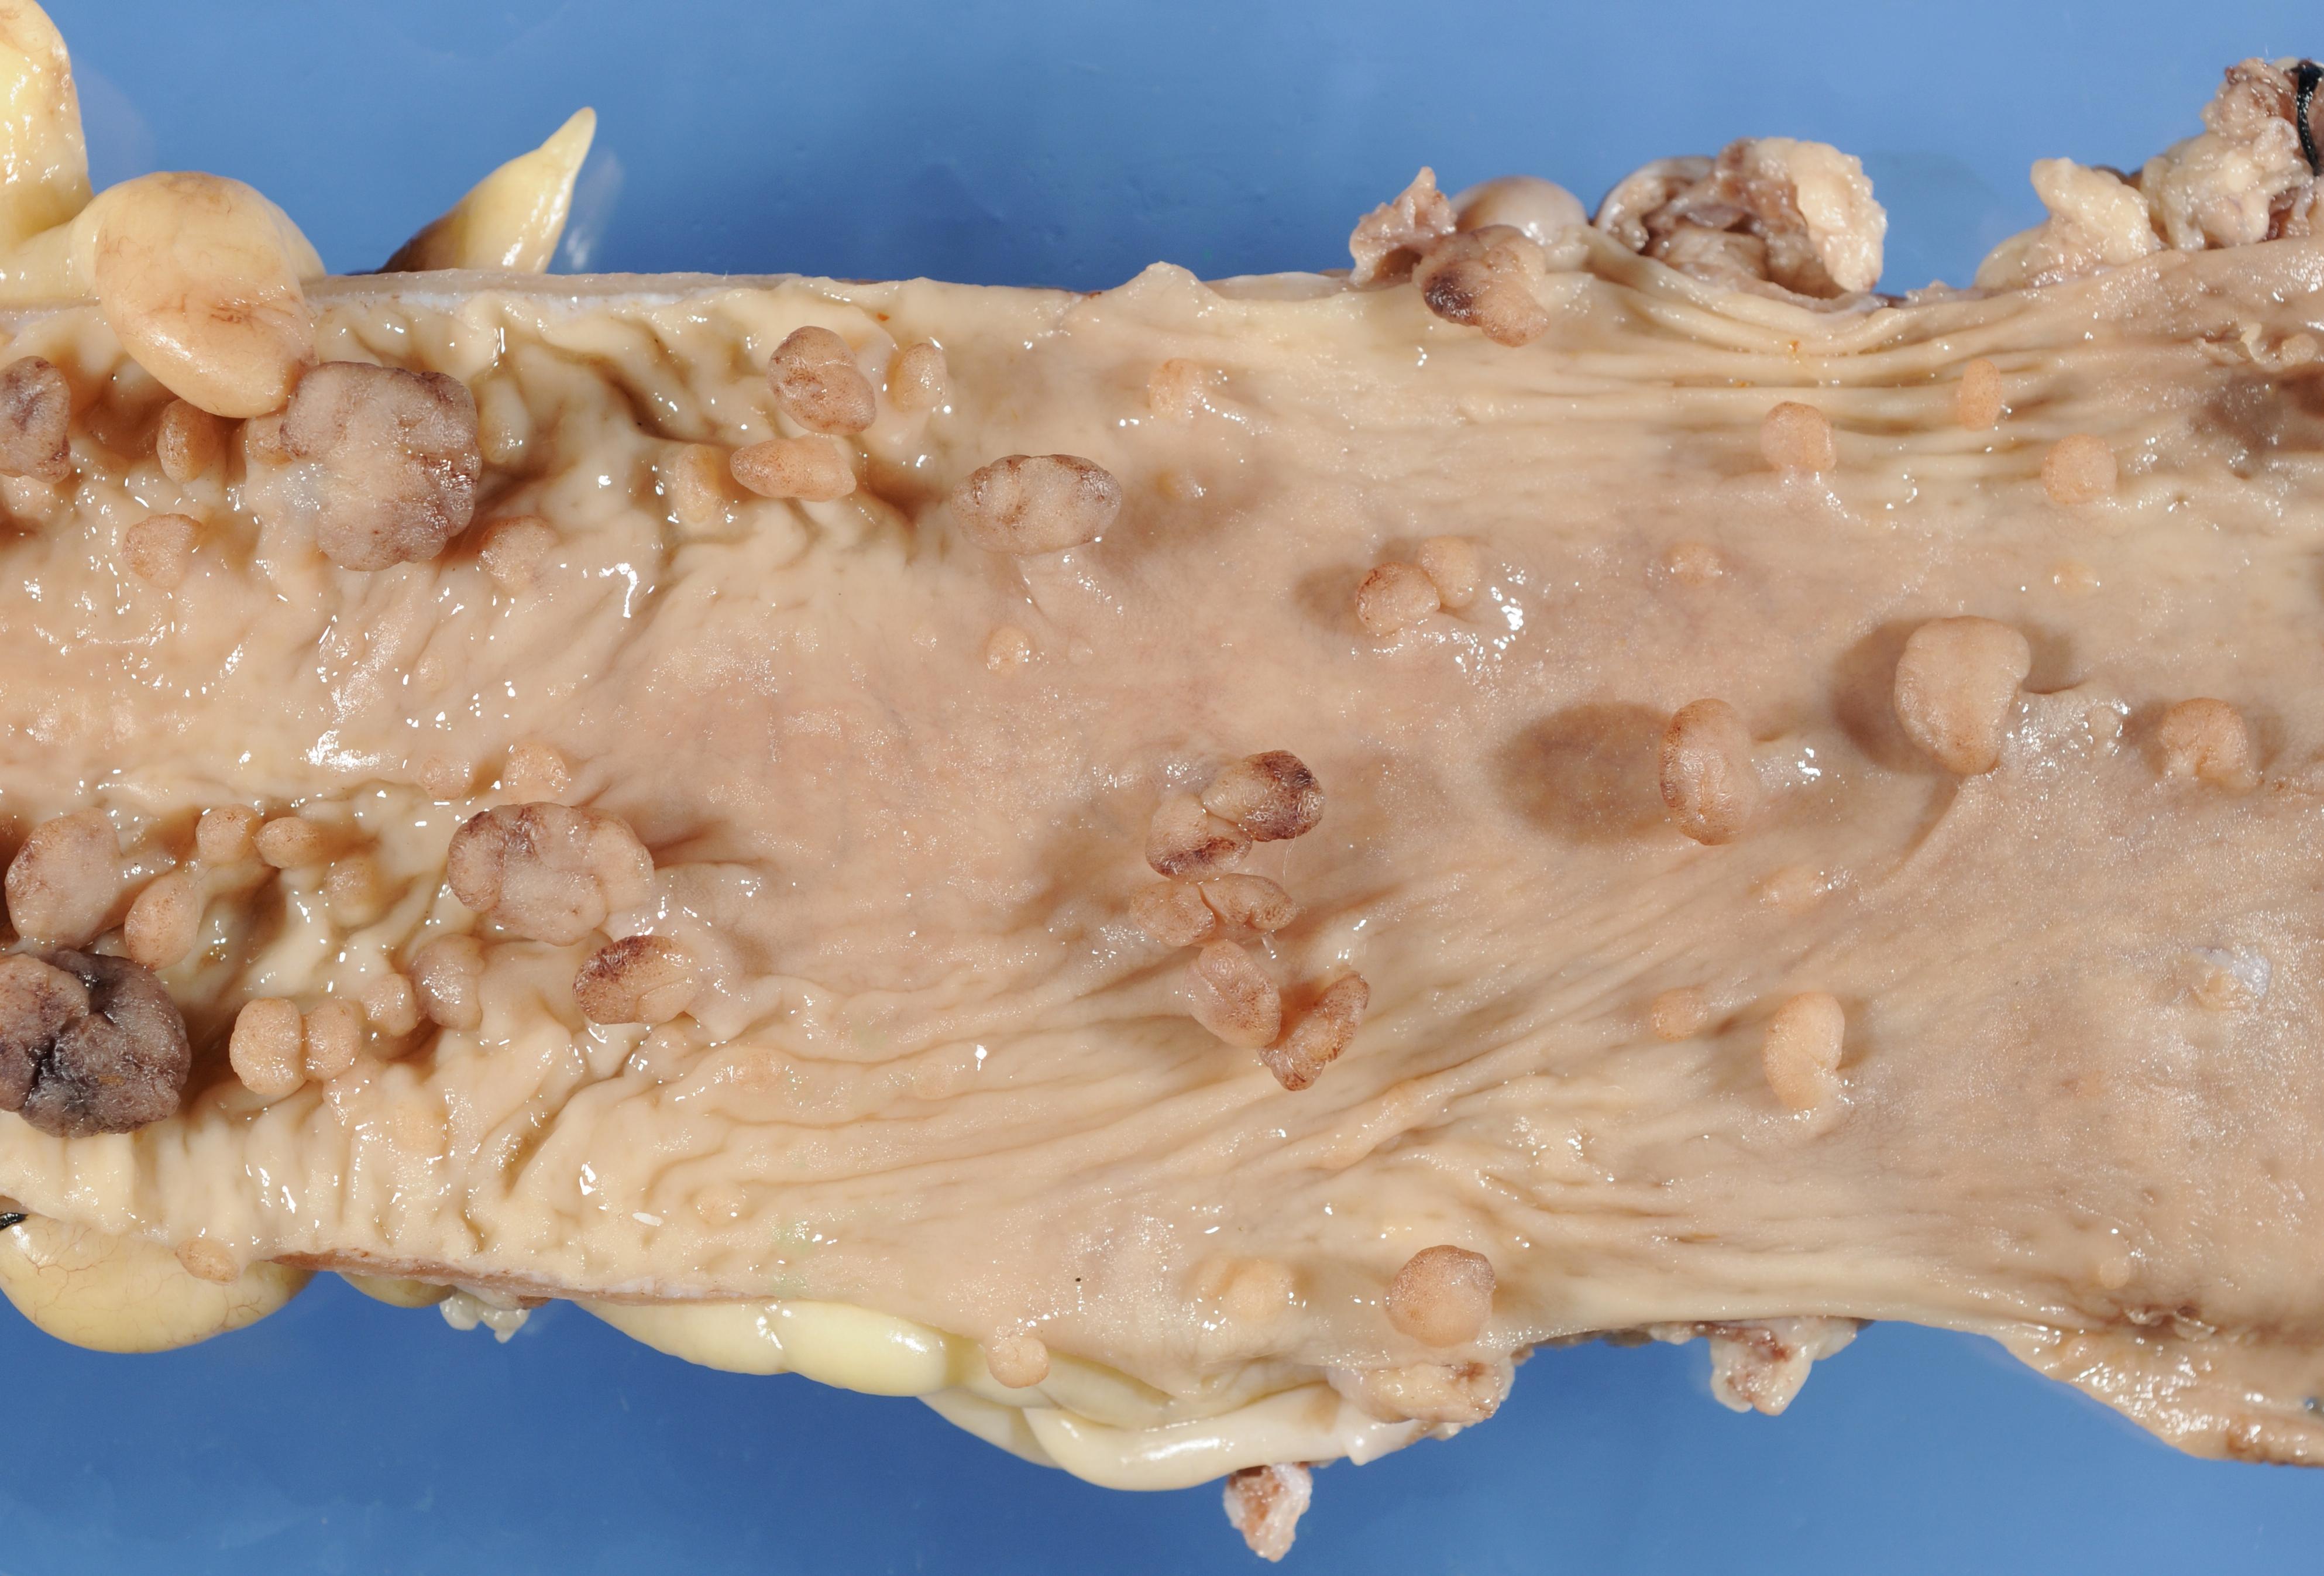 familial adenomatous polyposis - Humpath.com - Human pathology